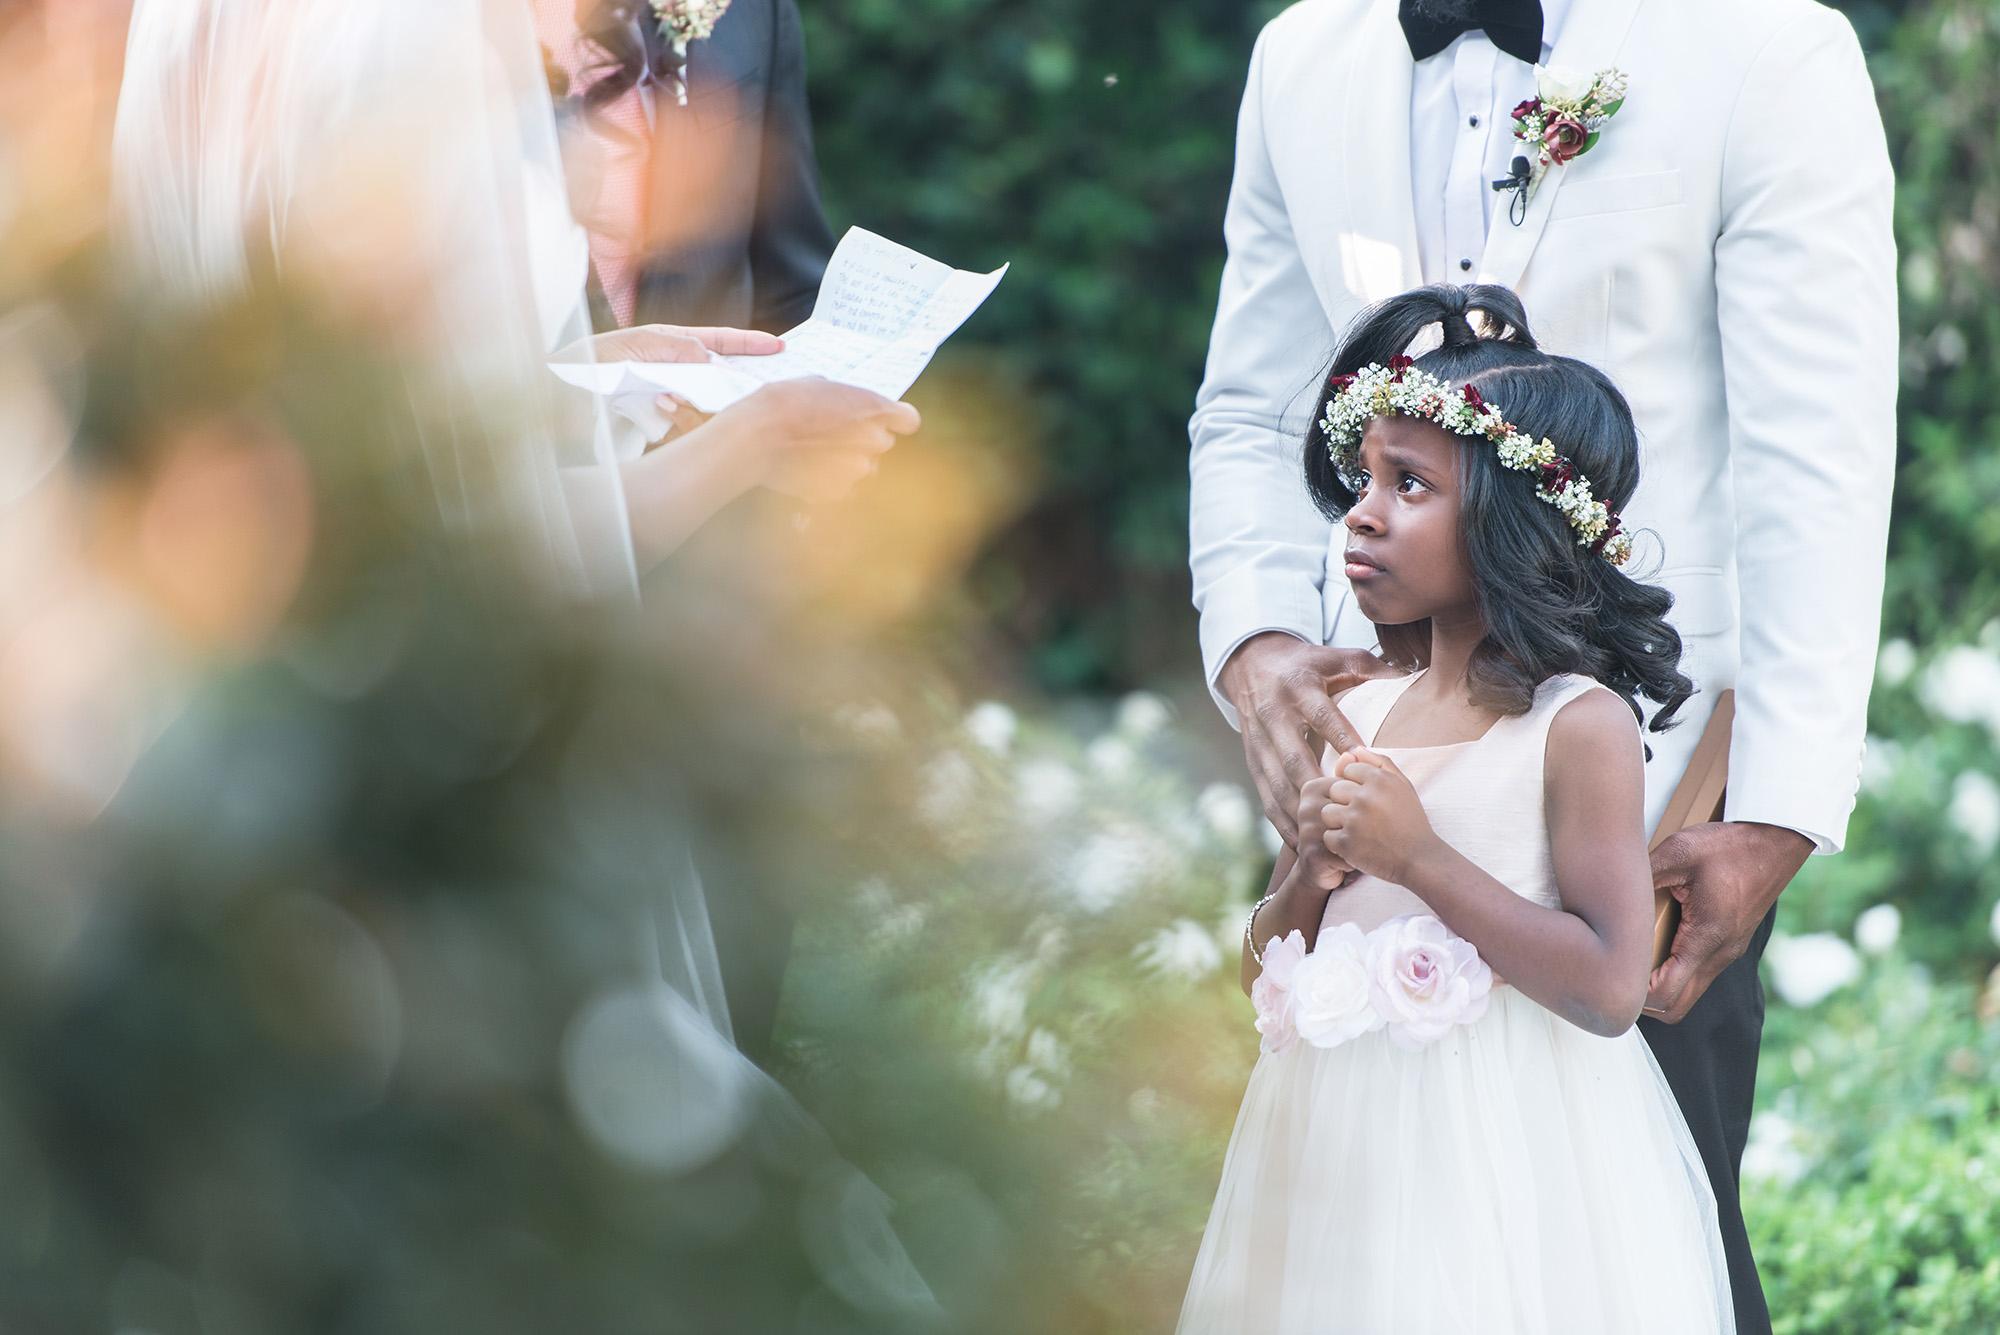 associate-photographer-christmas-house-wedding-carrie-vines-0092.jpg